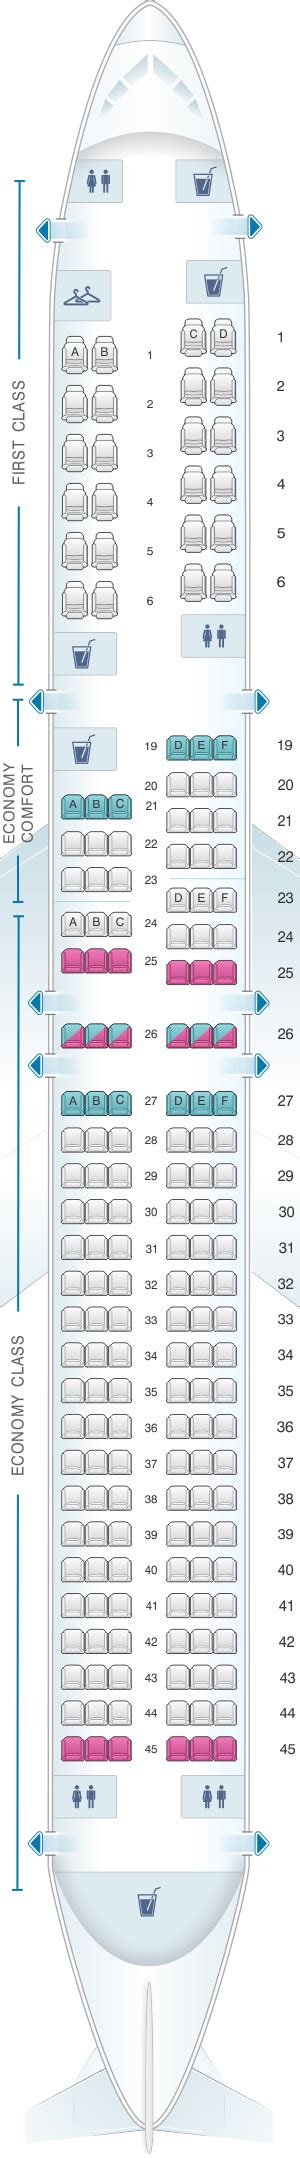 boeing 757 200 seats seat map delta air lines boeing b757 200 757 seatmaestro